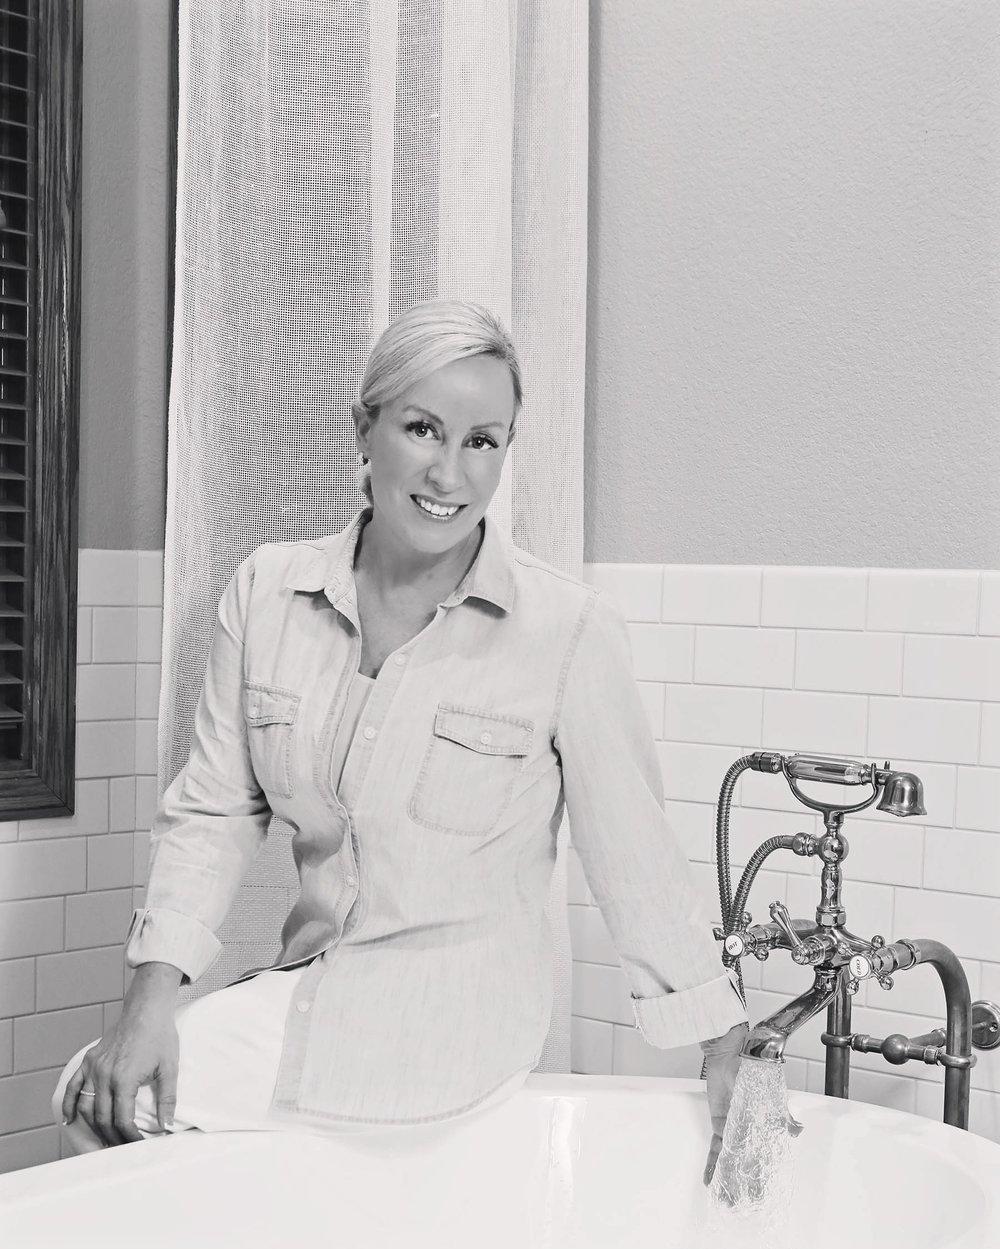 bathtub_blkandwht_lowres.JPG